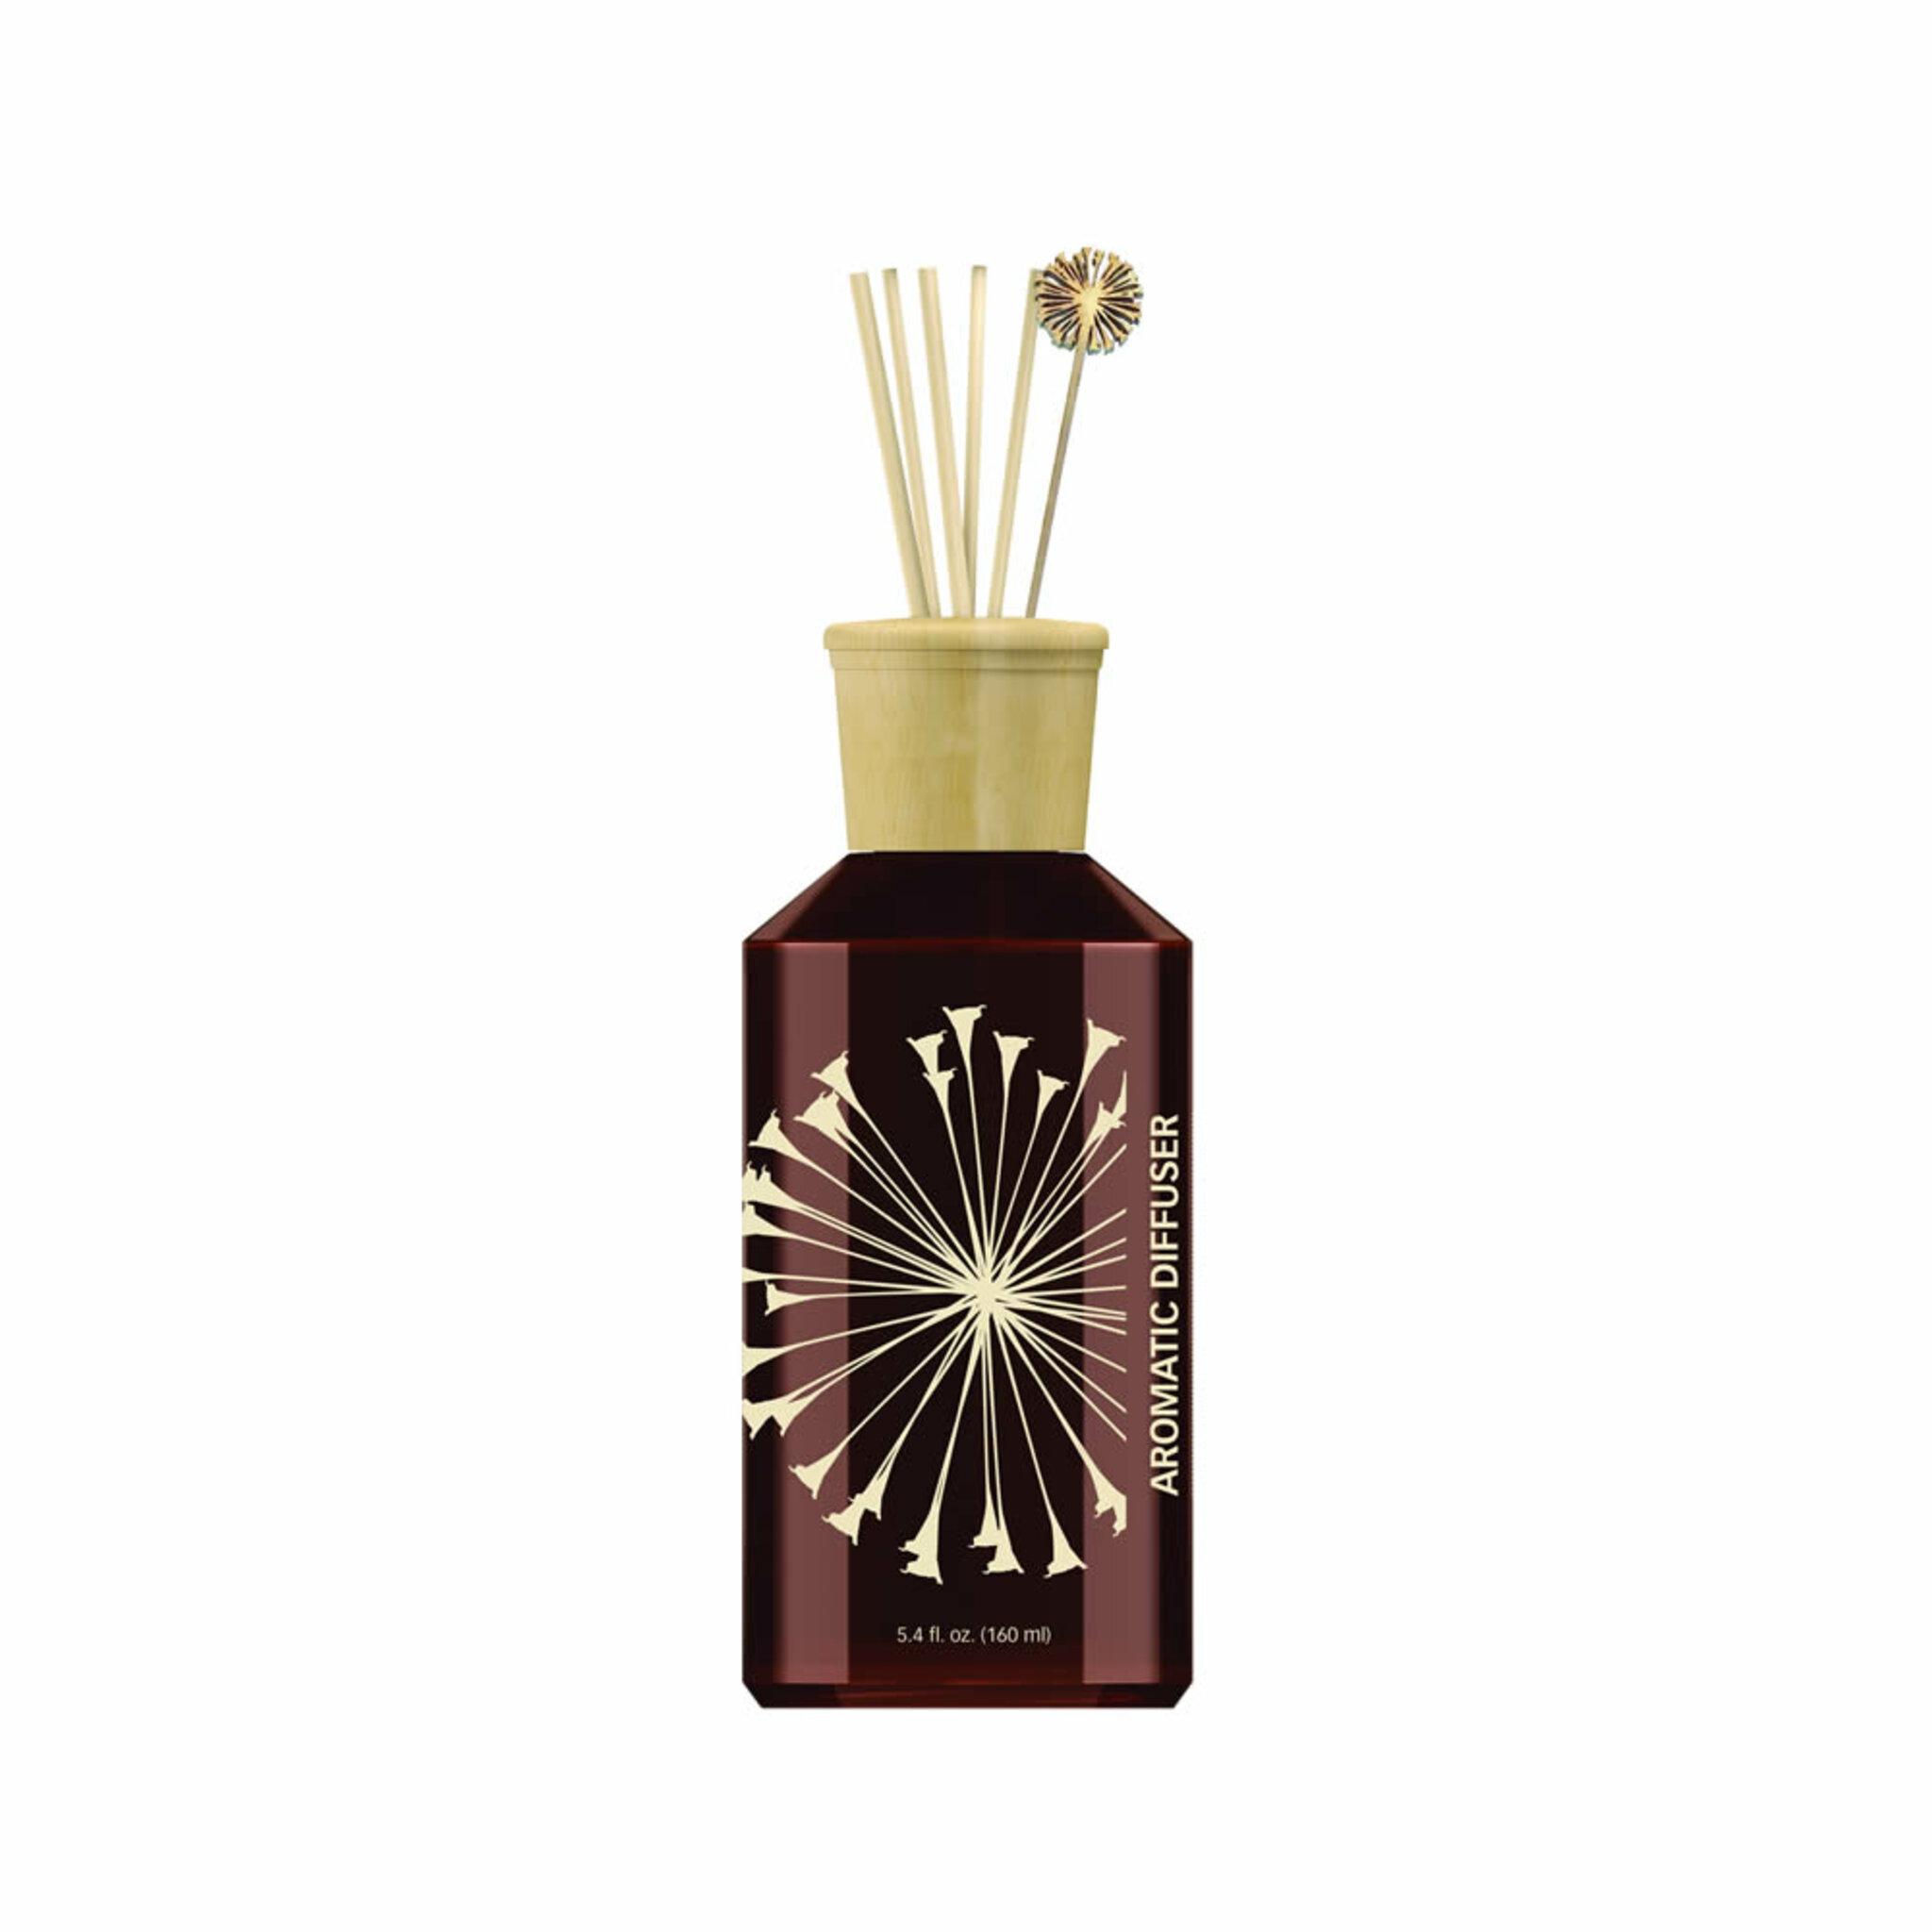 Aromatic Diffuser, 160 ml - Tsamma Blend